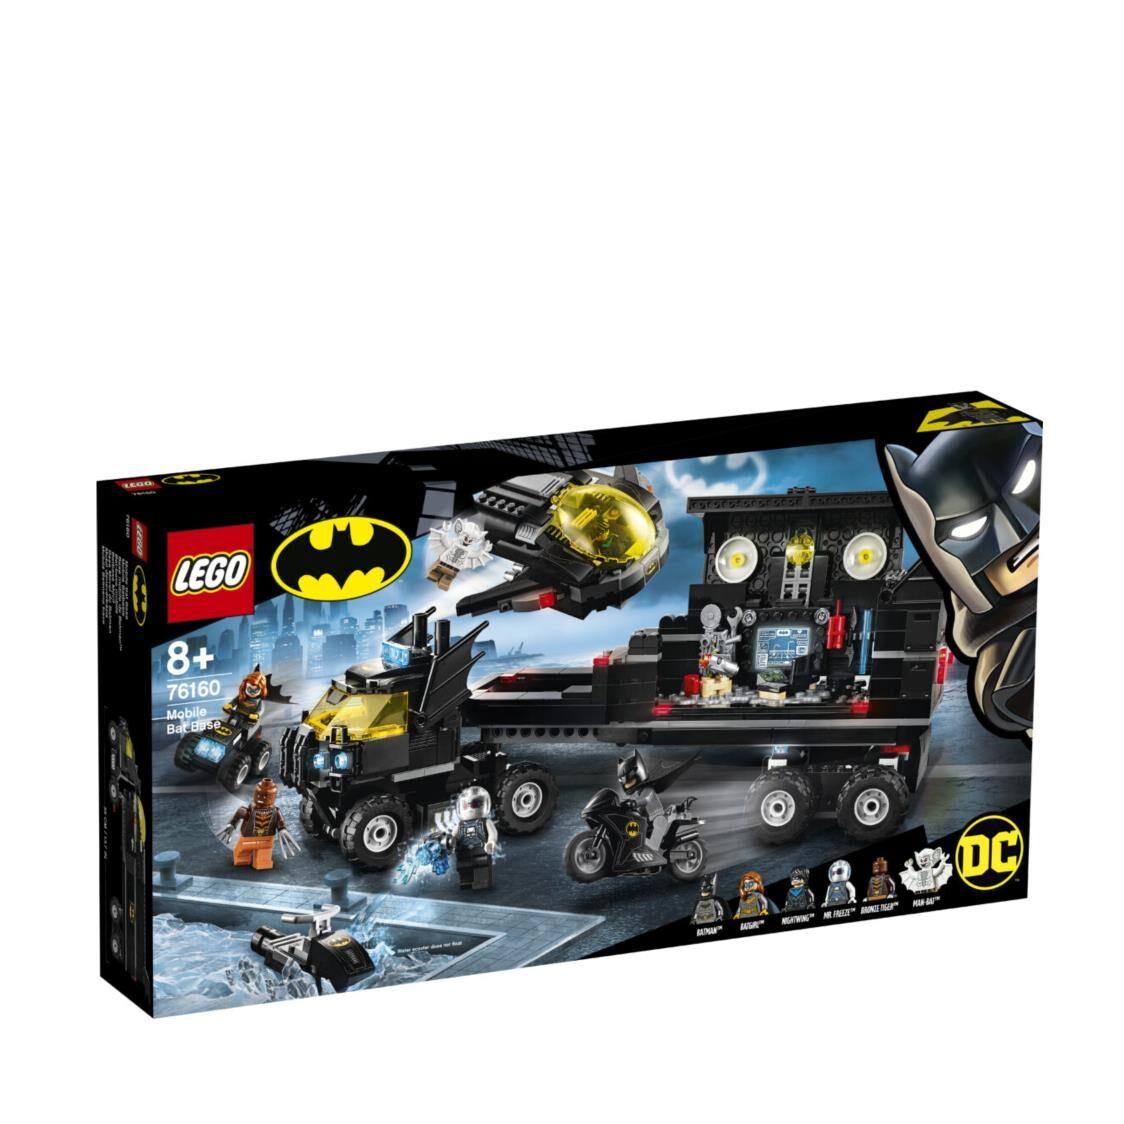 LEGO BATMAN - Mobile Bat Base 76160